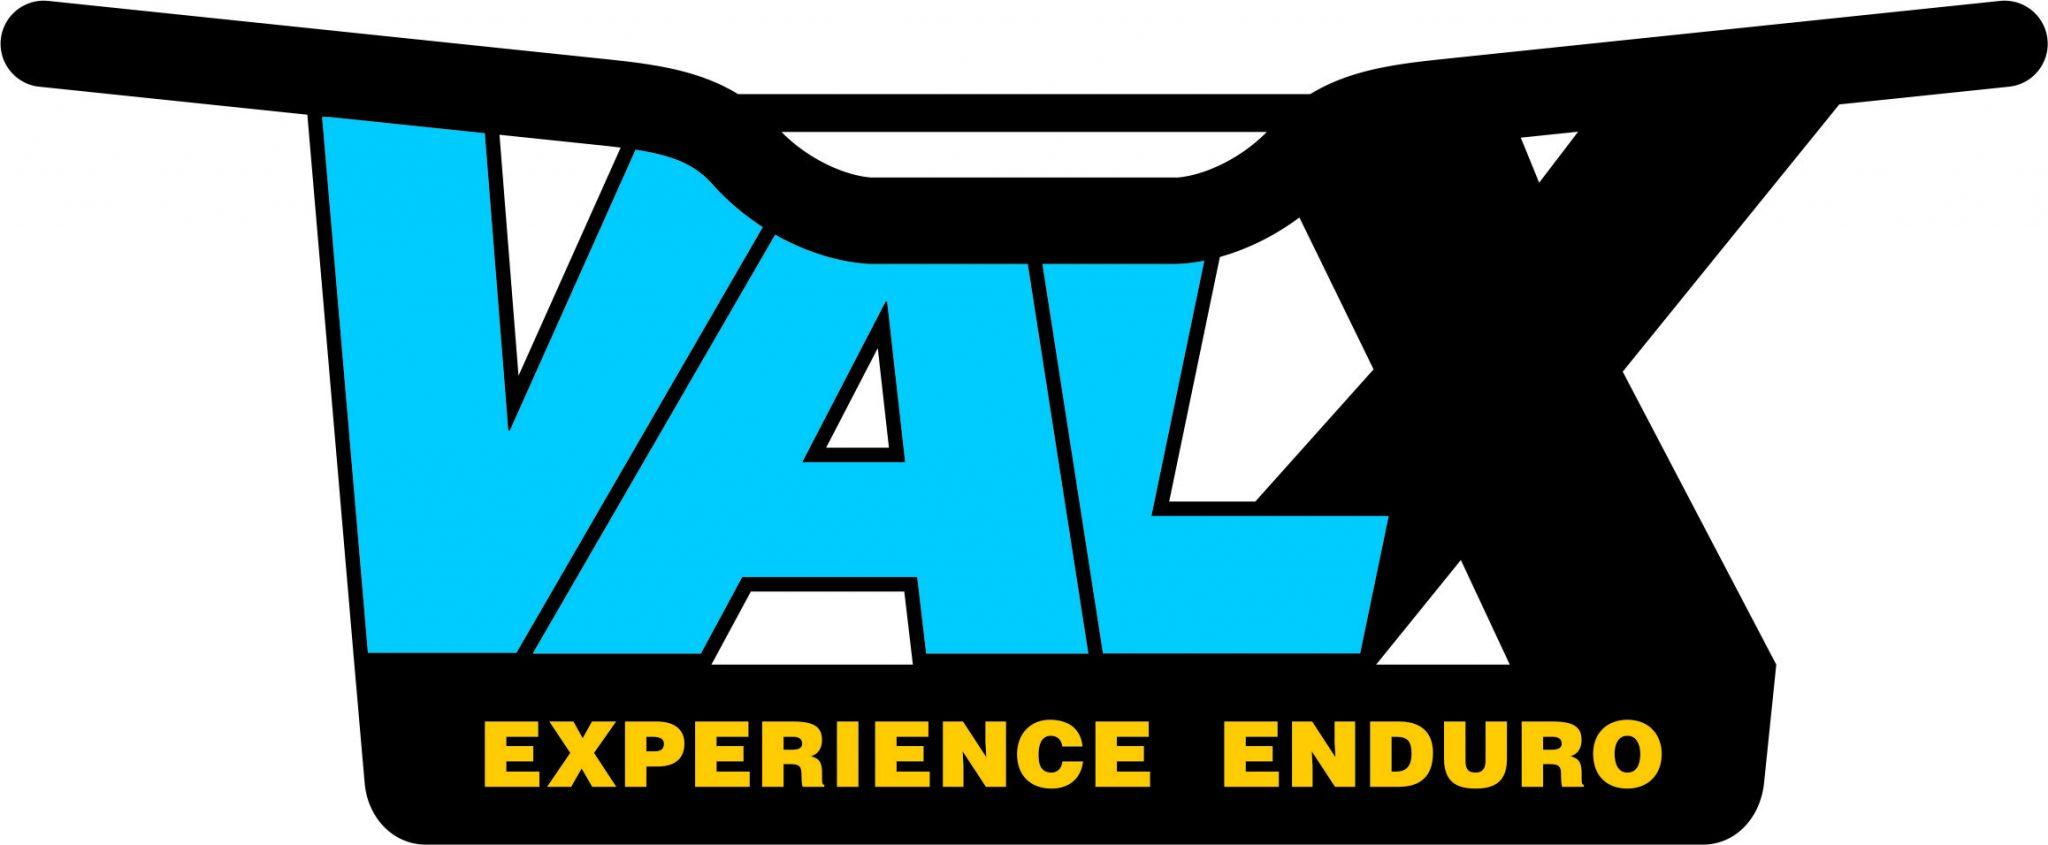 valX-logo-final